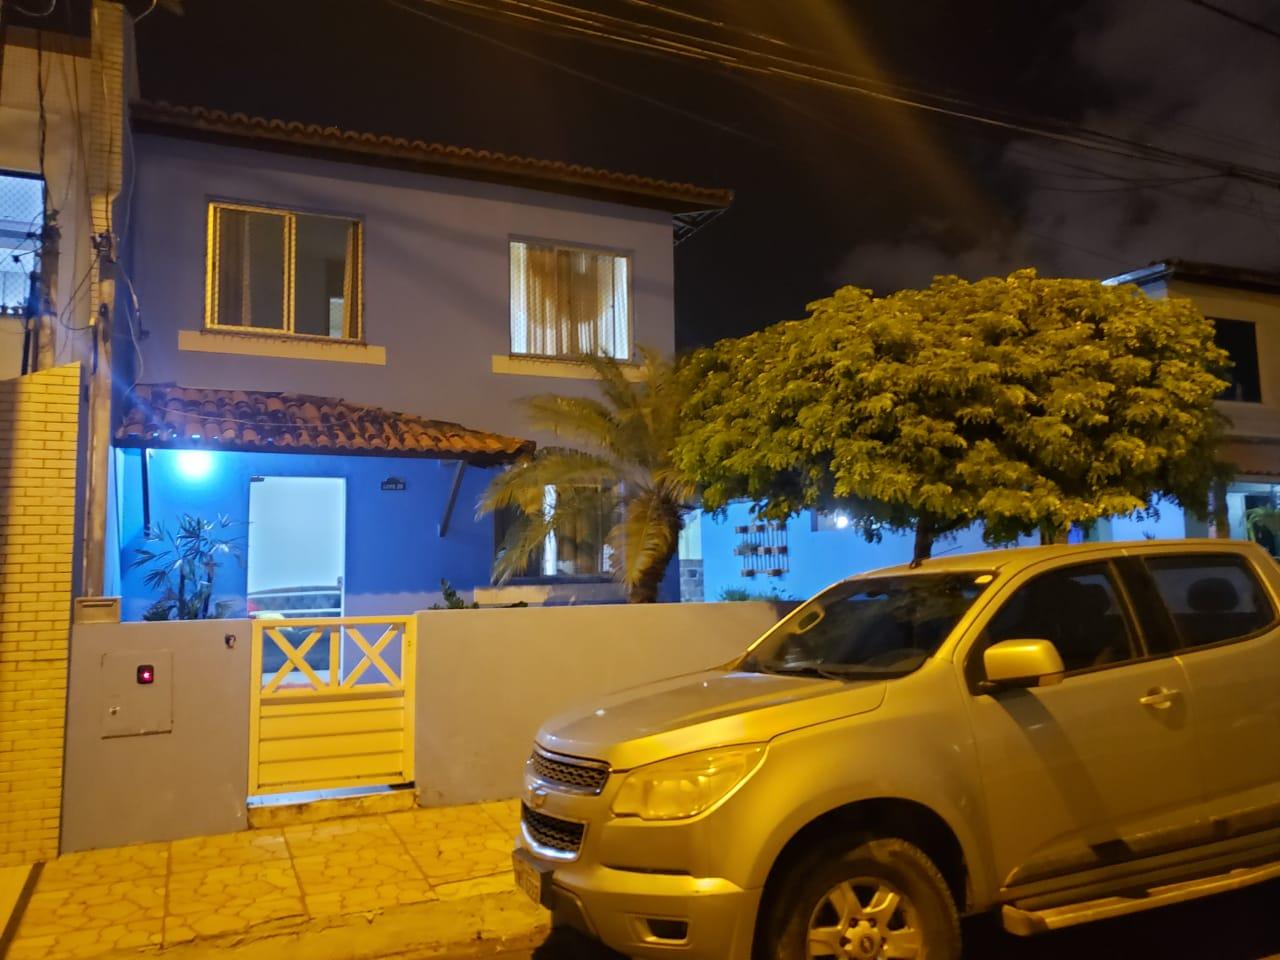 CASA REFORMADA NO COND VIVENDAS DE ARACAJU, SIQUEIRA CAMPOS